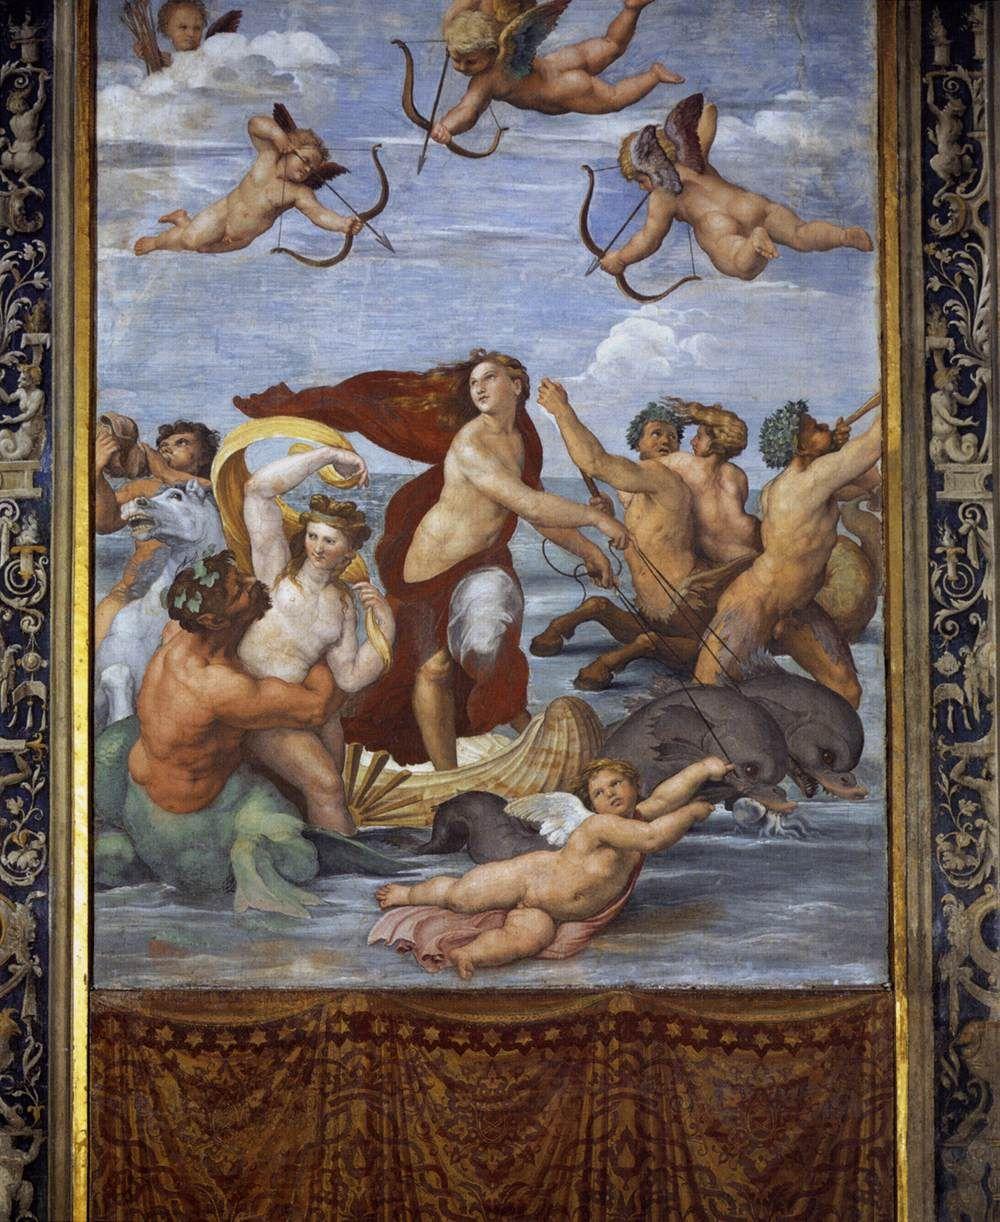 raphael's triumph of galatea 01 - raphael - wikipedia, the free